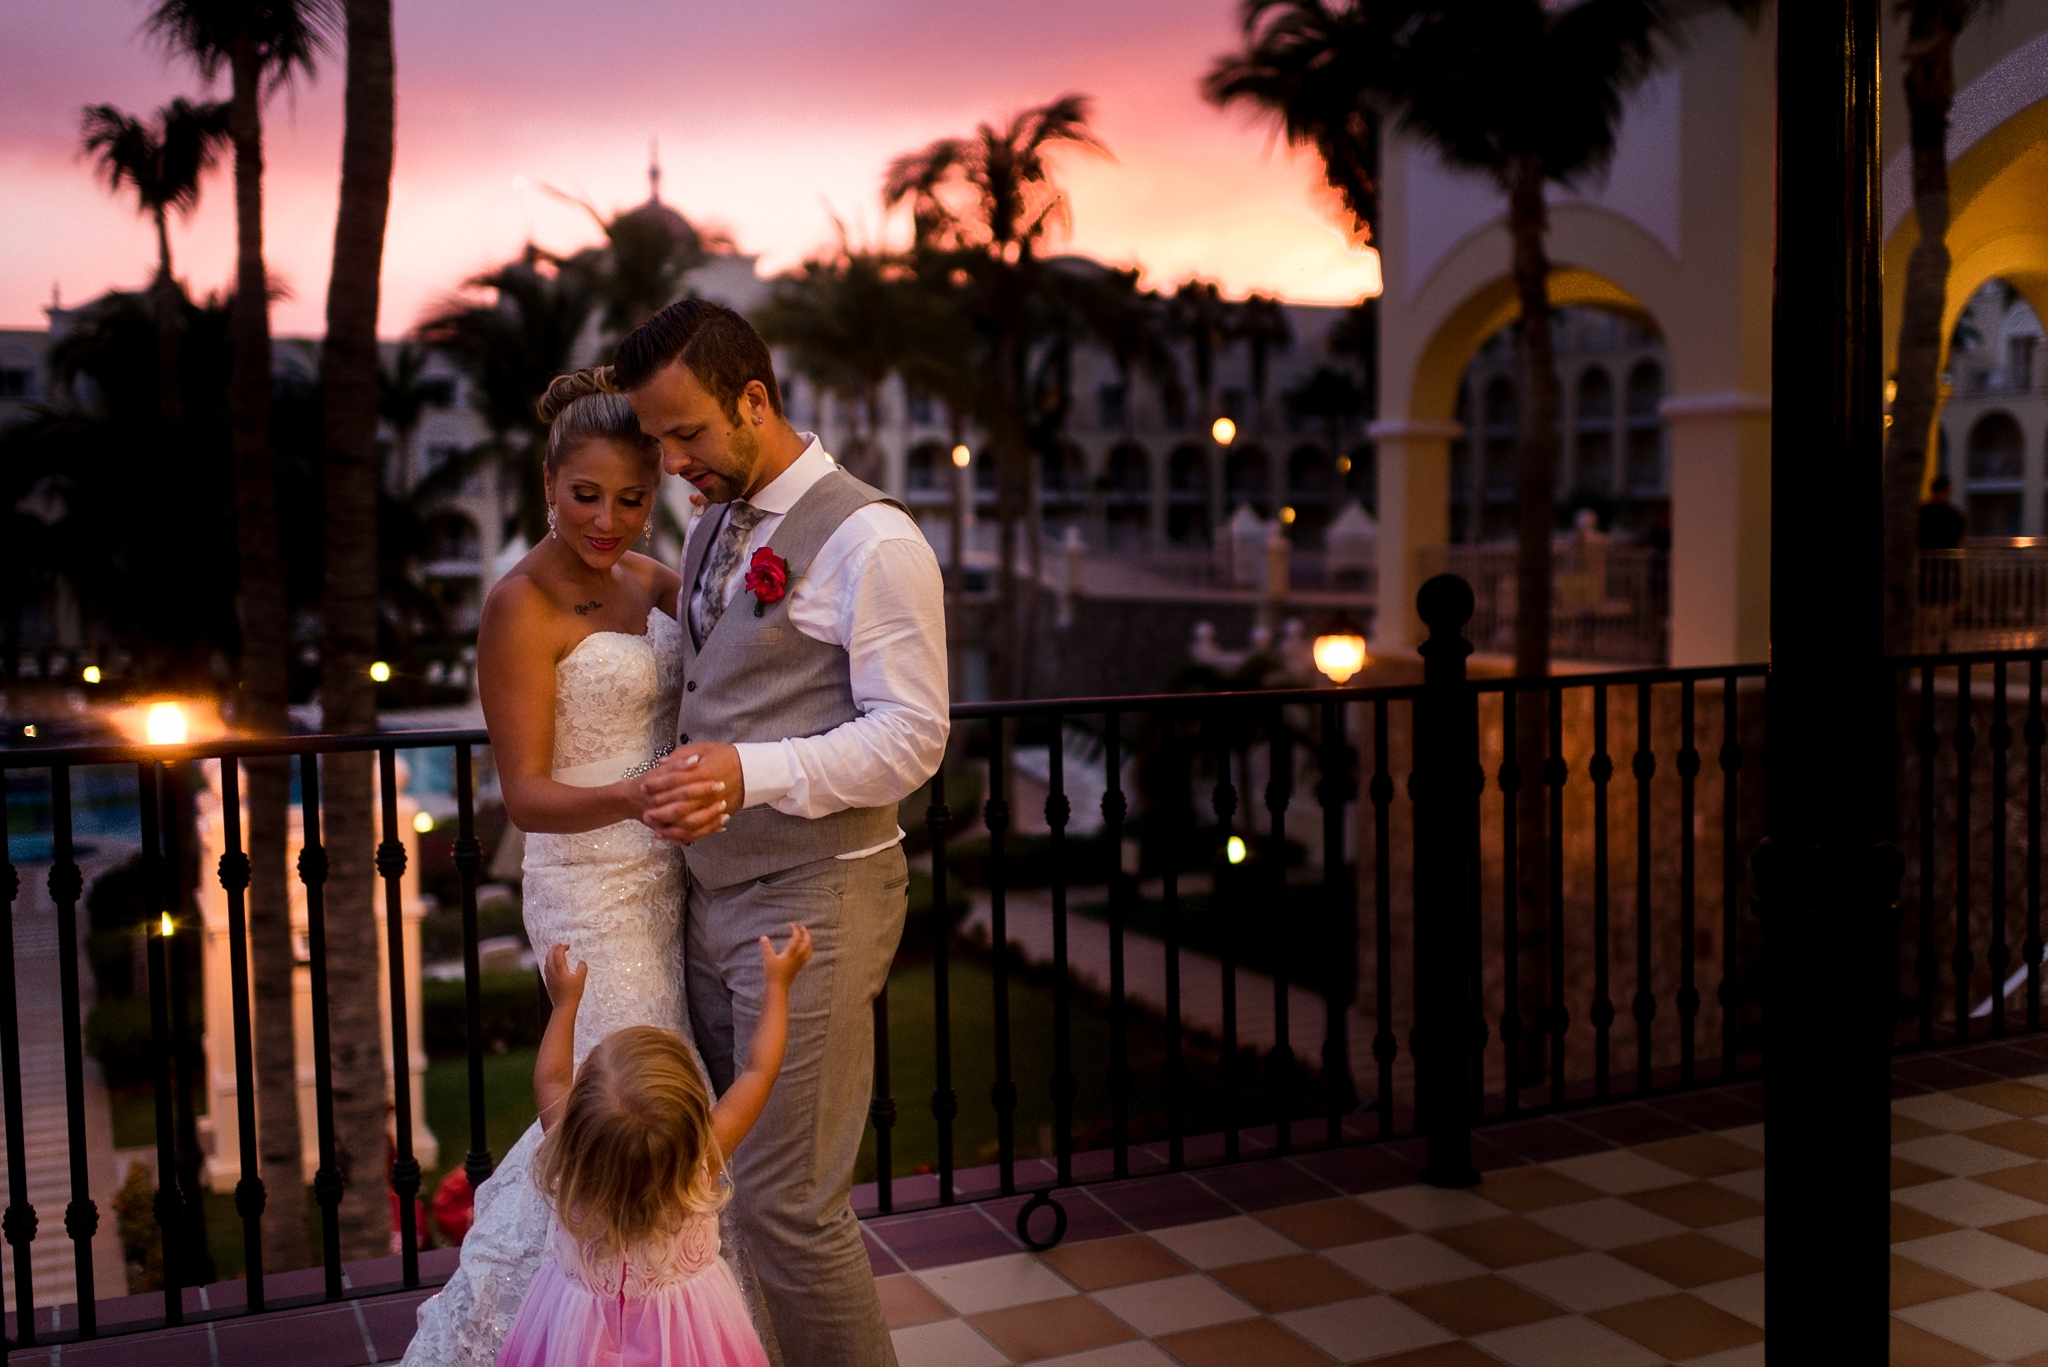 kaihla_tonai_intimate_wedding_elopement_photographer_1386